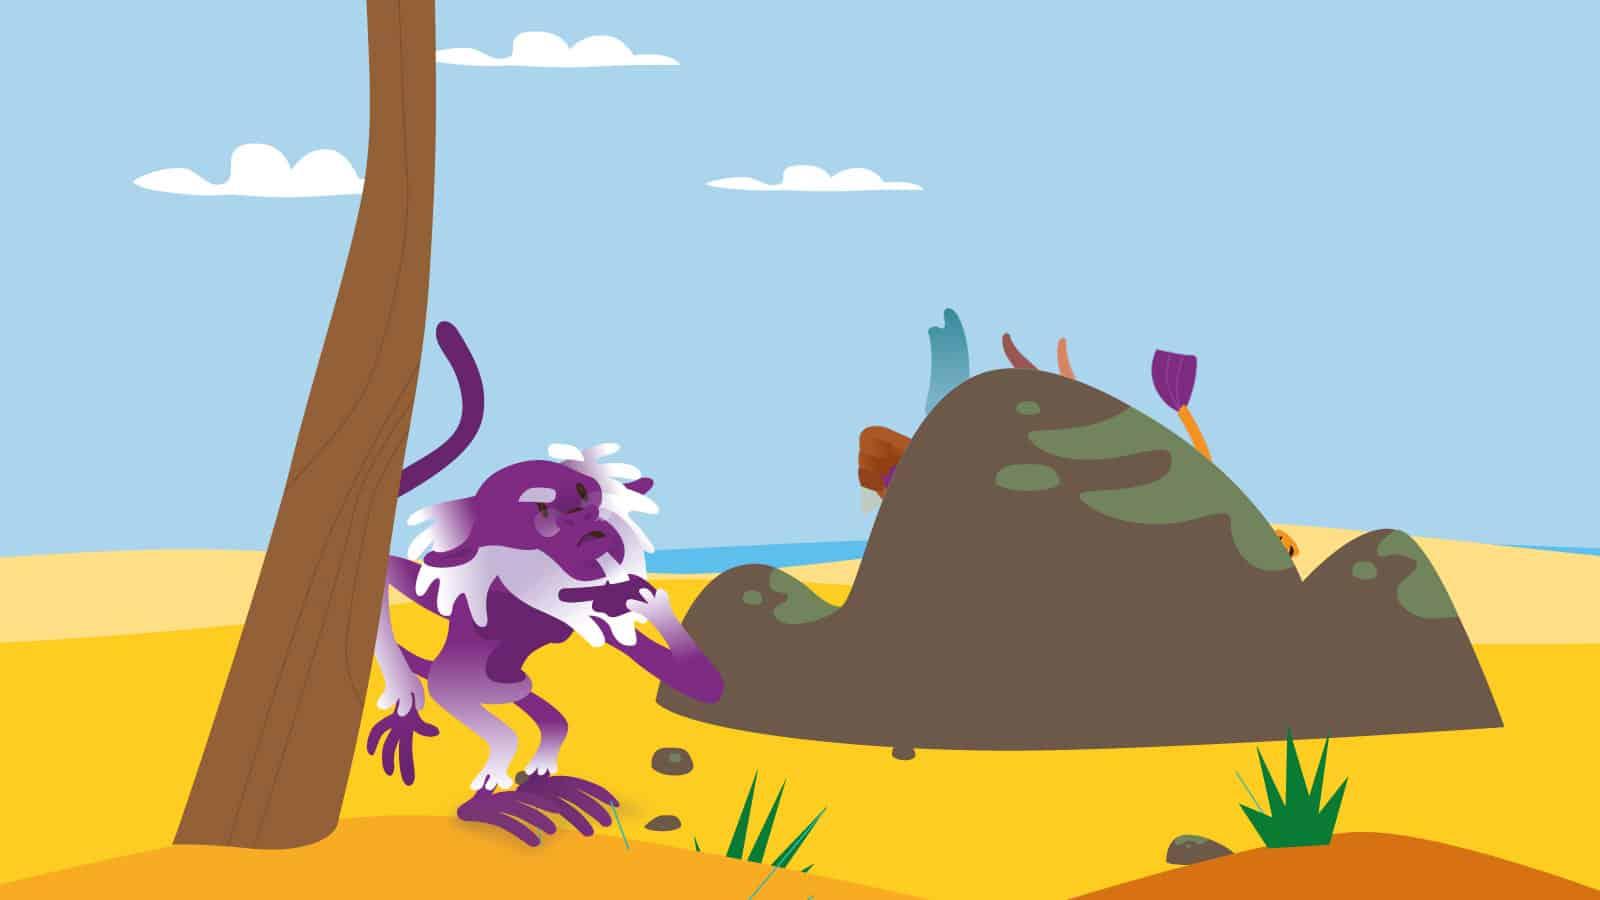 Safari Lokali – Vind alle vriendjes in jouw buurt